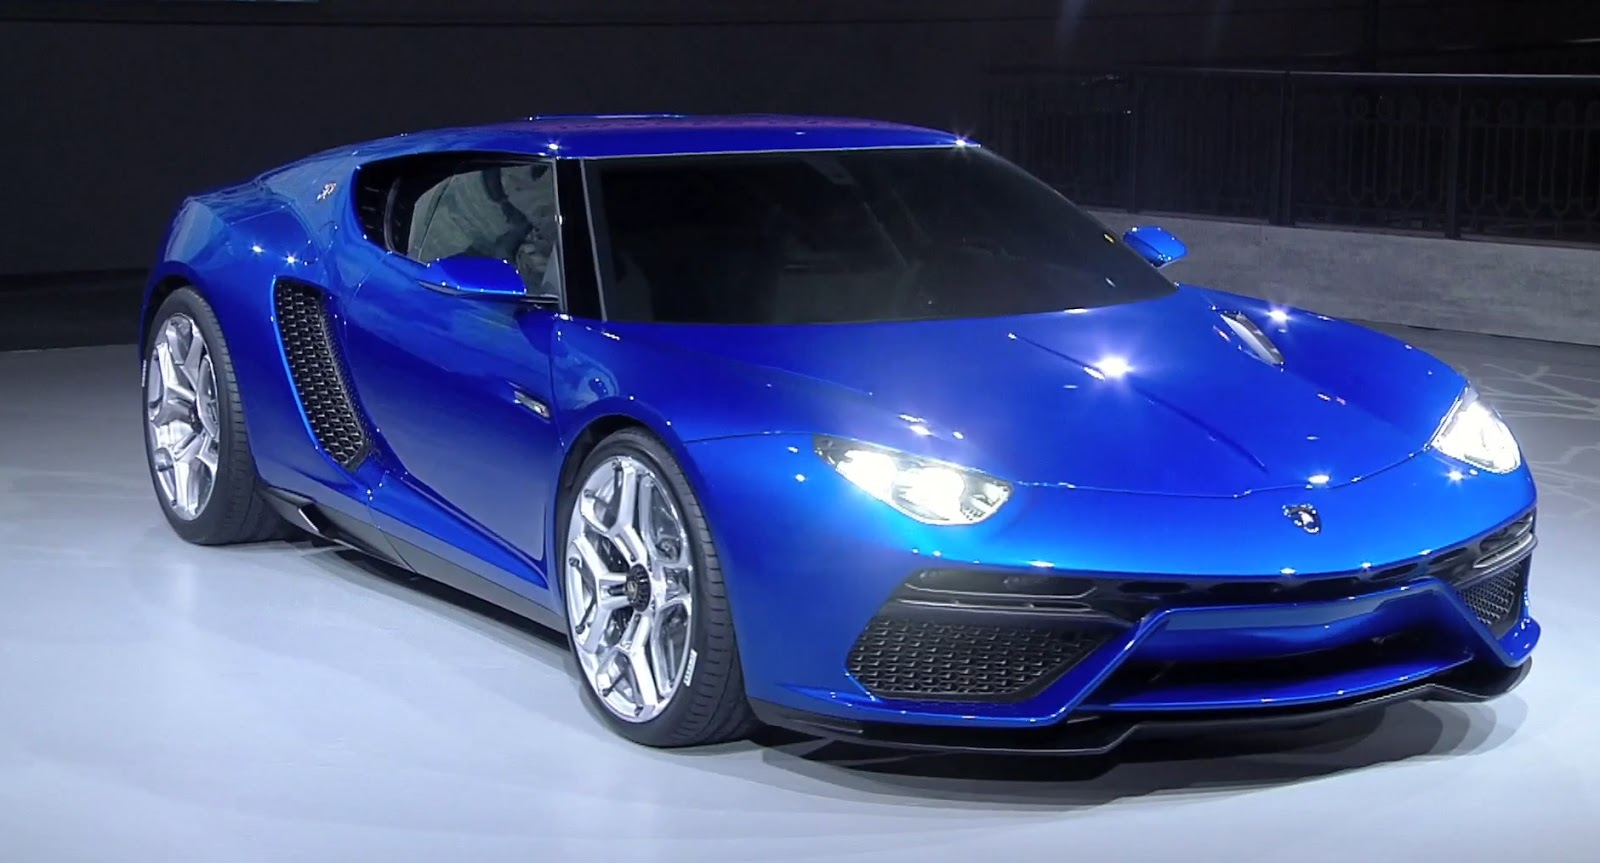 Lamborghini Asterion LPI 910-4: Live Photos And Videos